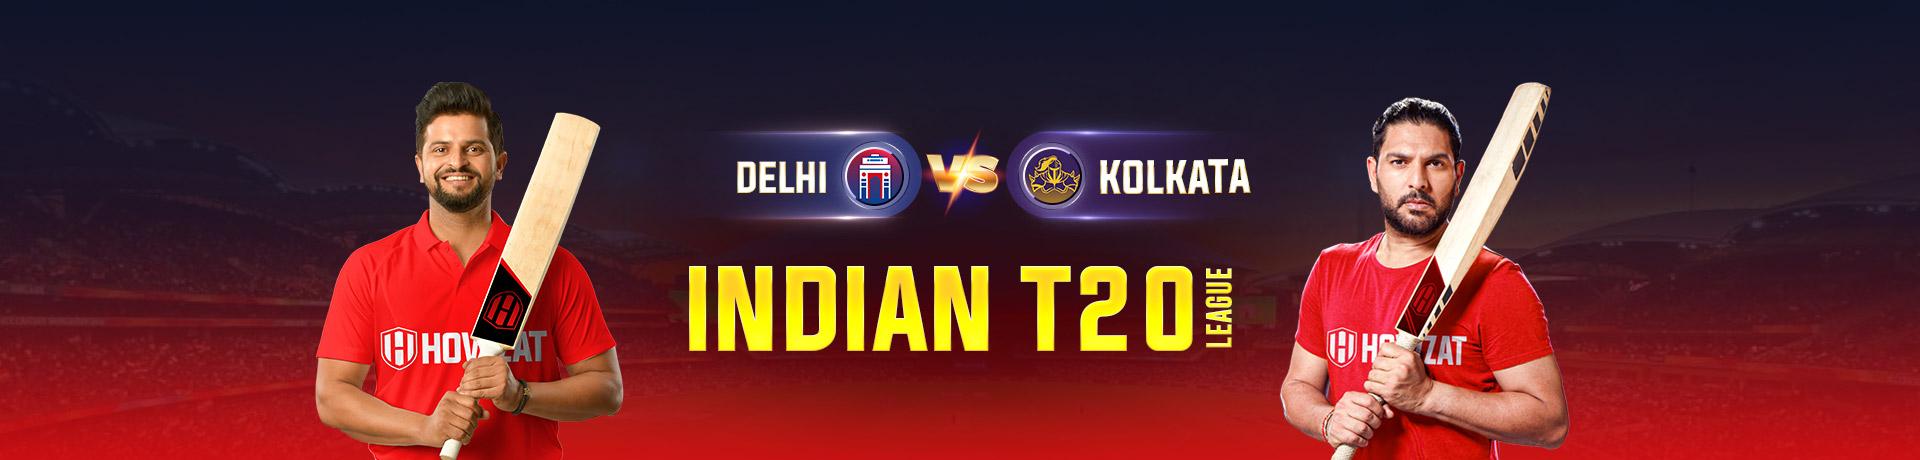 Delhi vs Kolkata Indian T20 League 2021